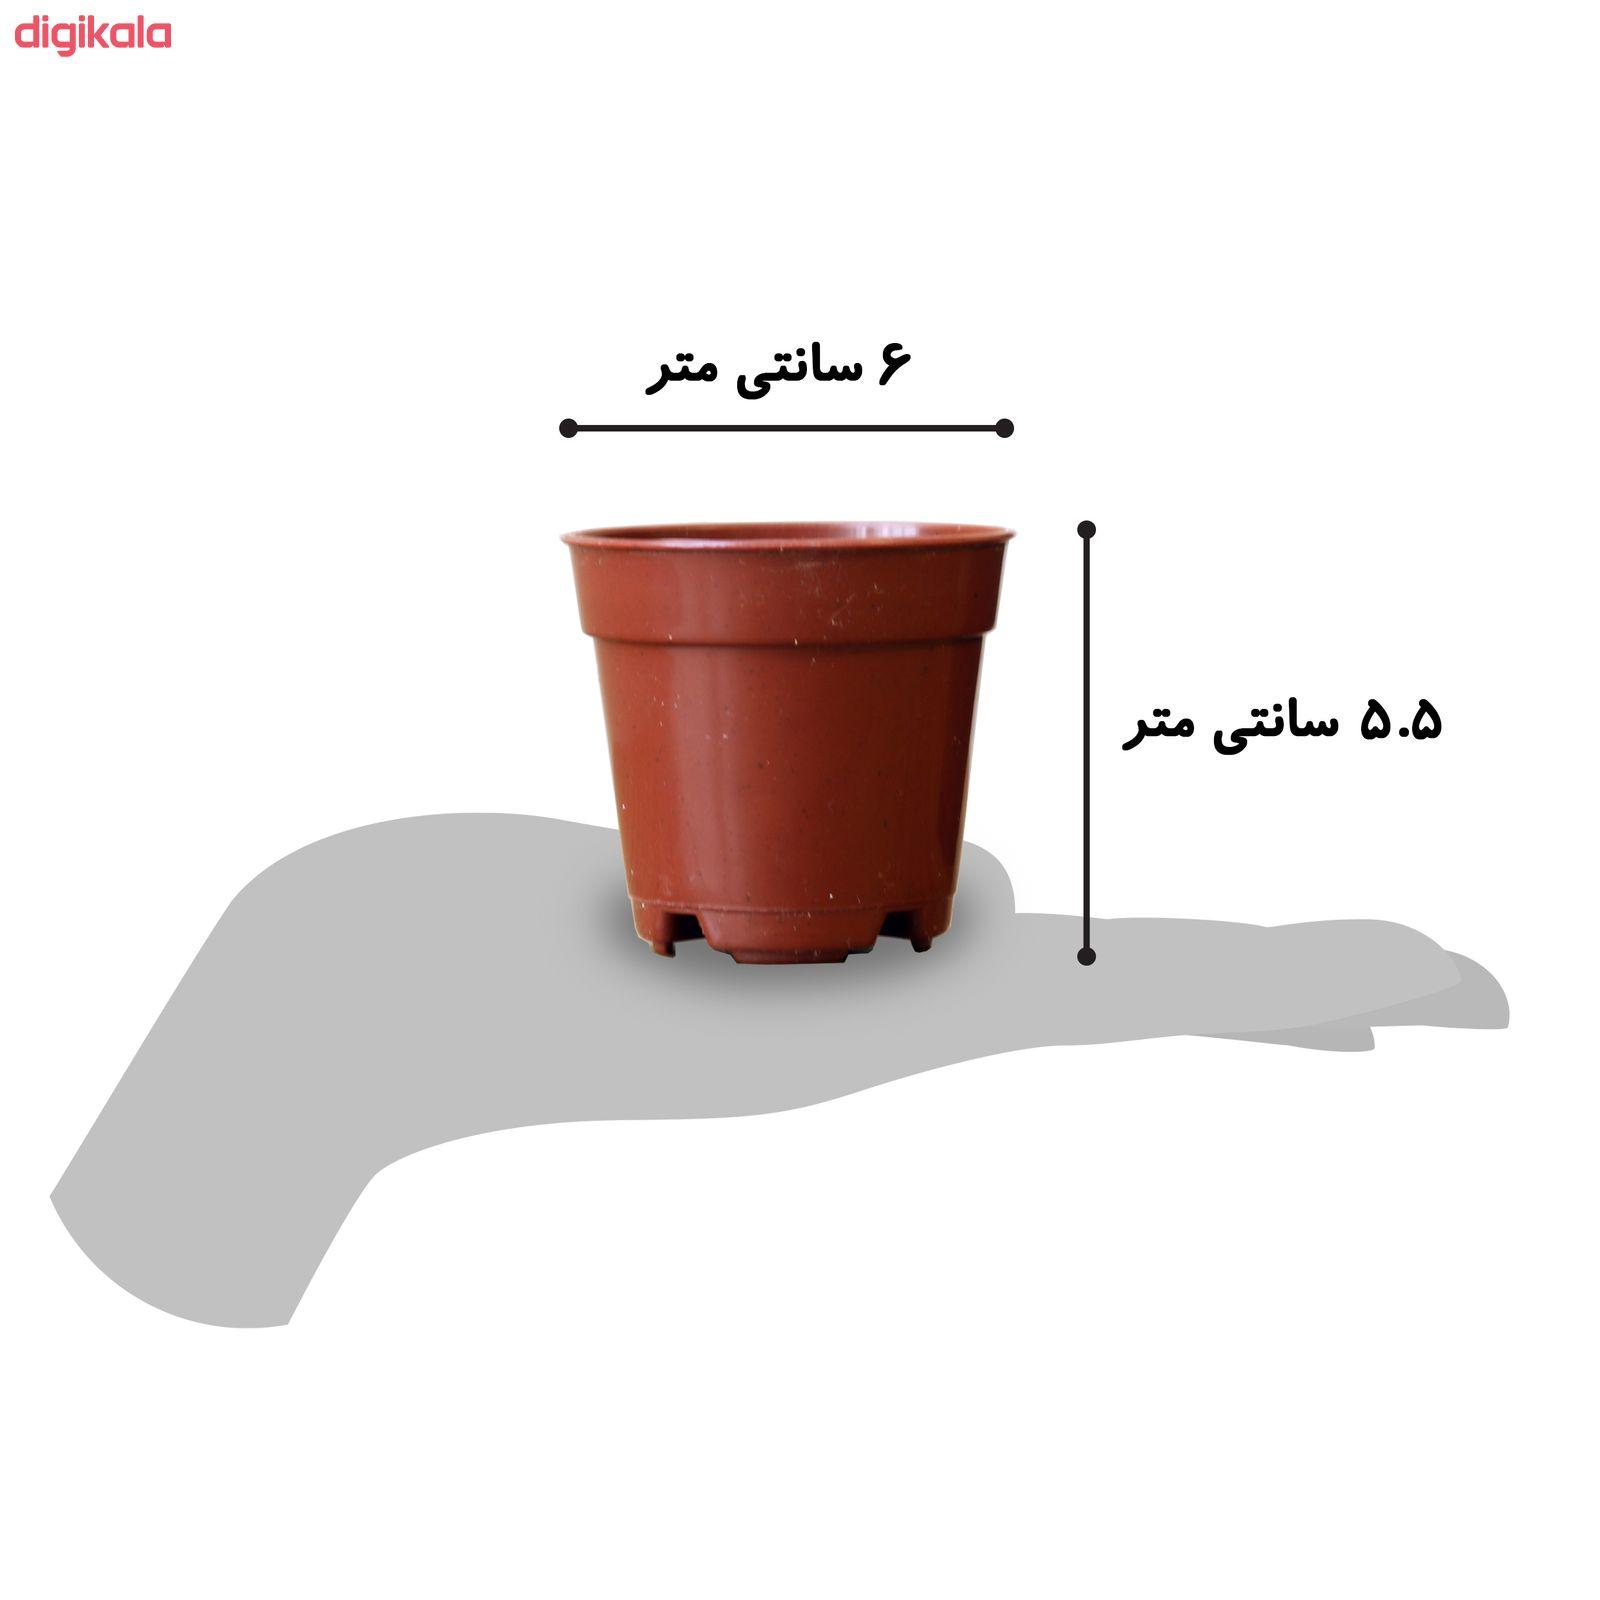 گیاه طبیعی کاکتوس و ساکولنت آیدین کاکتوس کد CB-004 بسته 12 عددی main 1 8